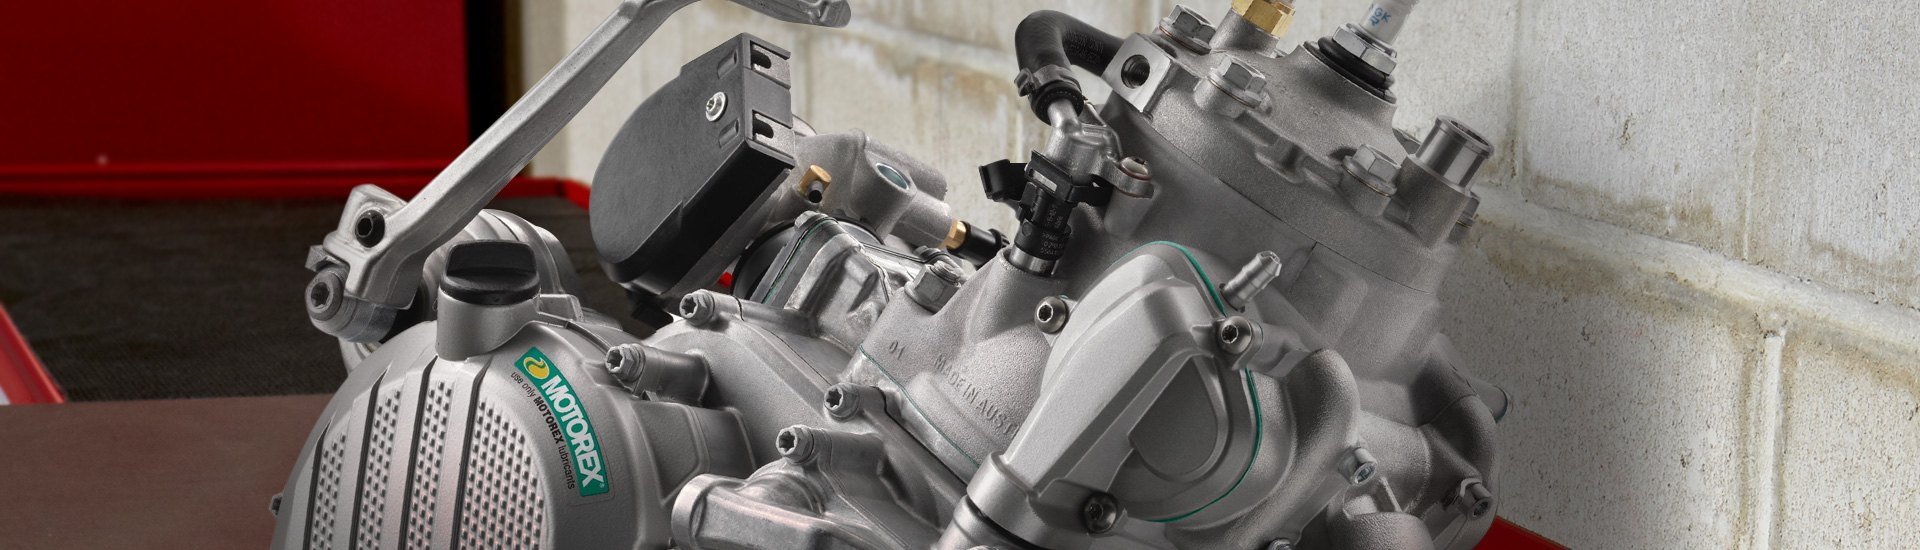 Powersports Engines